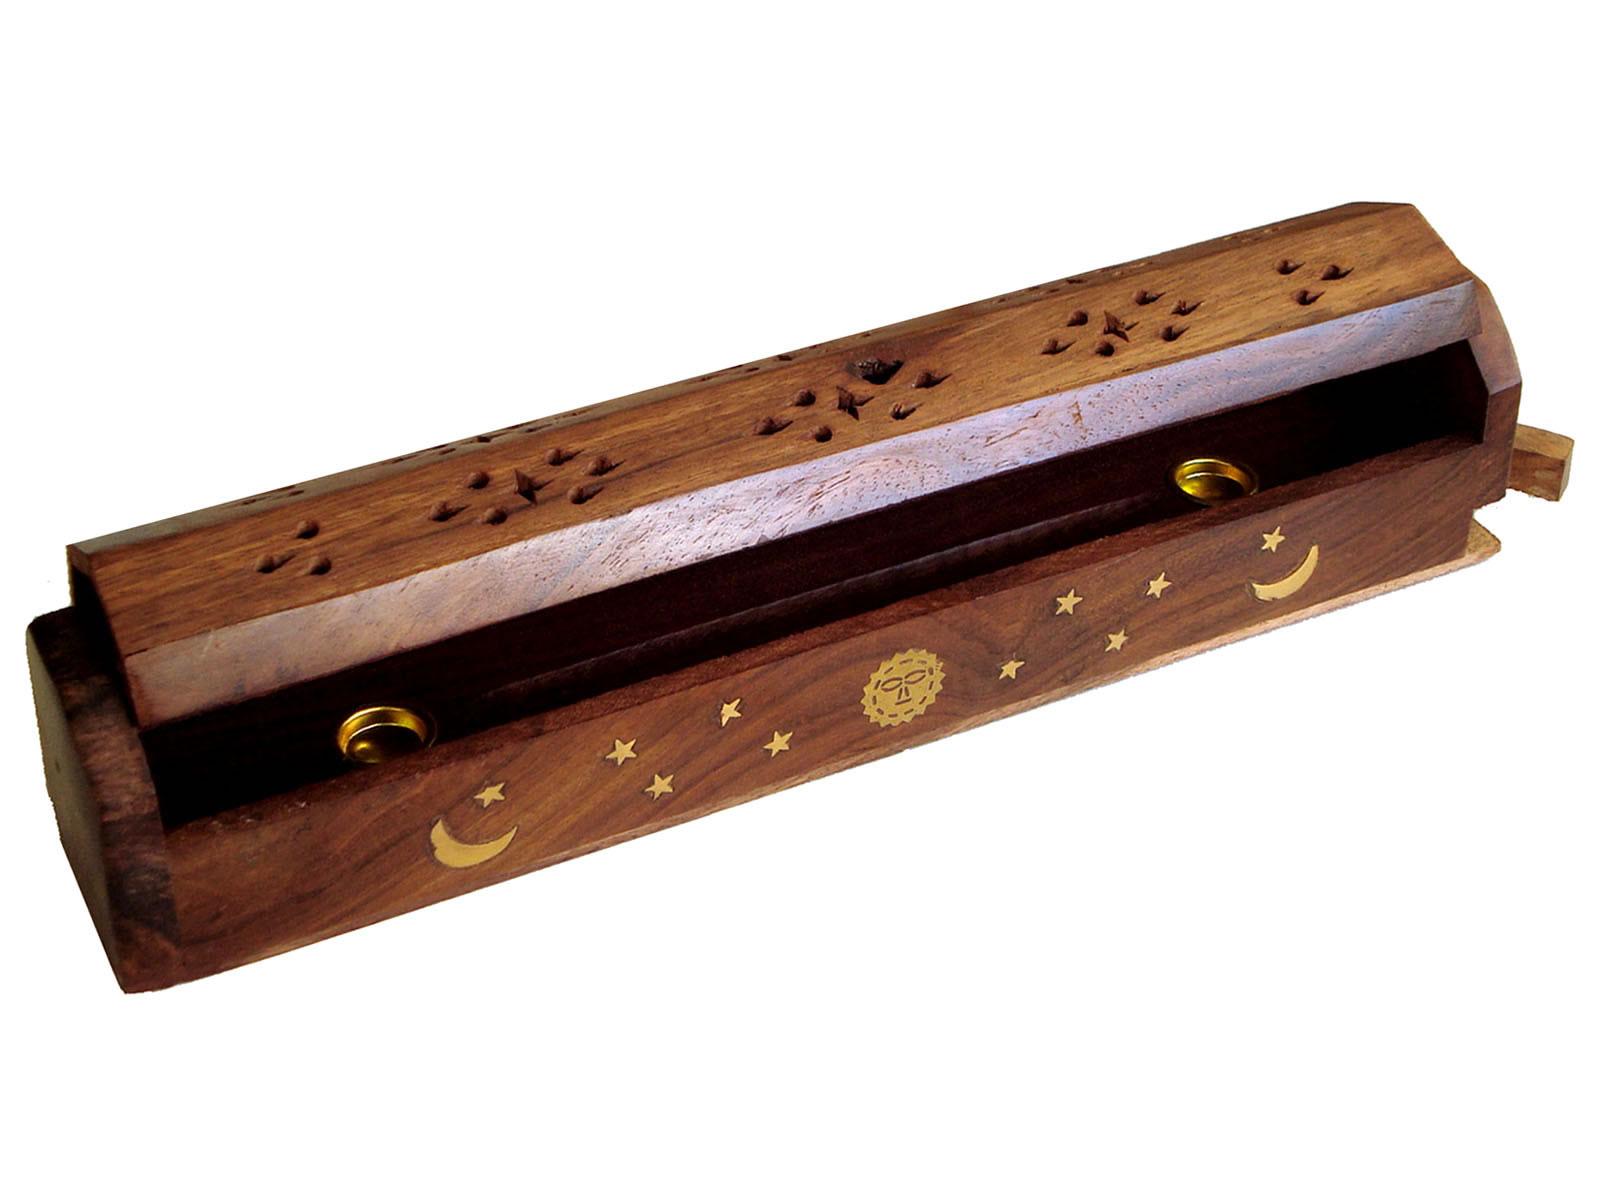 Incense Holder Box Burner - SUN, STARS, MOON